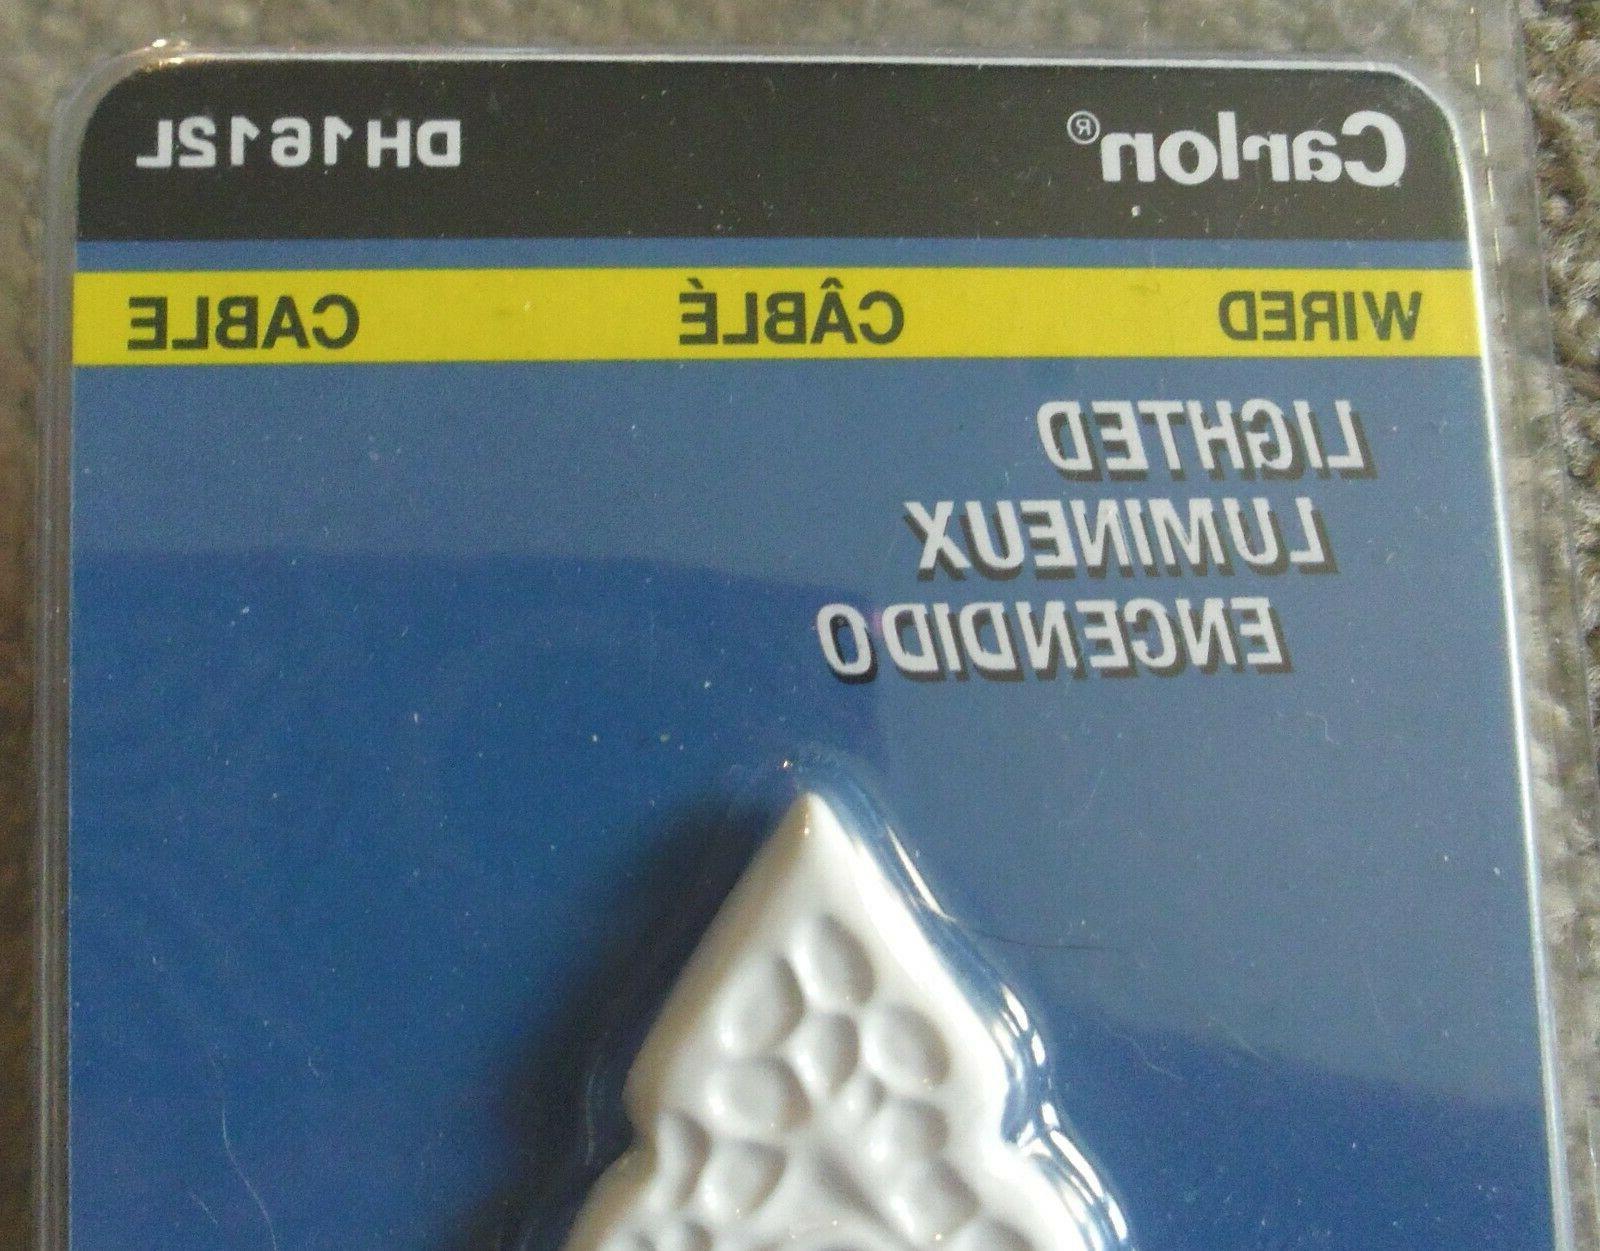 Carlon White Doorbell for Buzzers #DH1612L